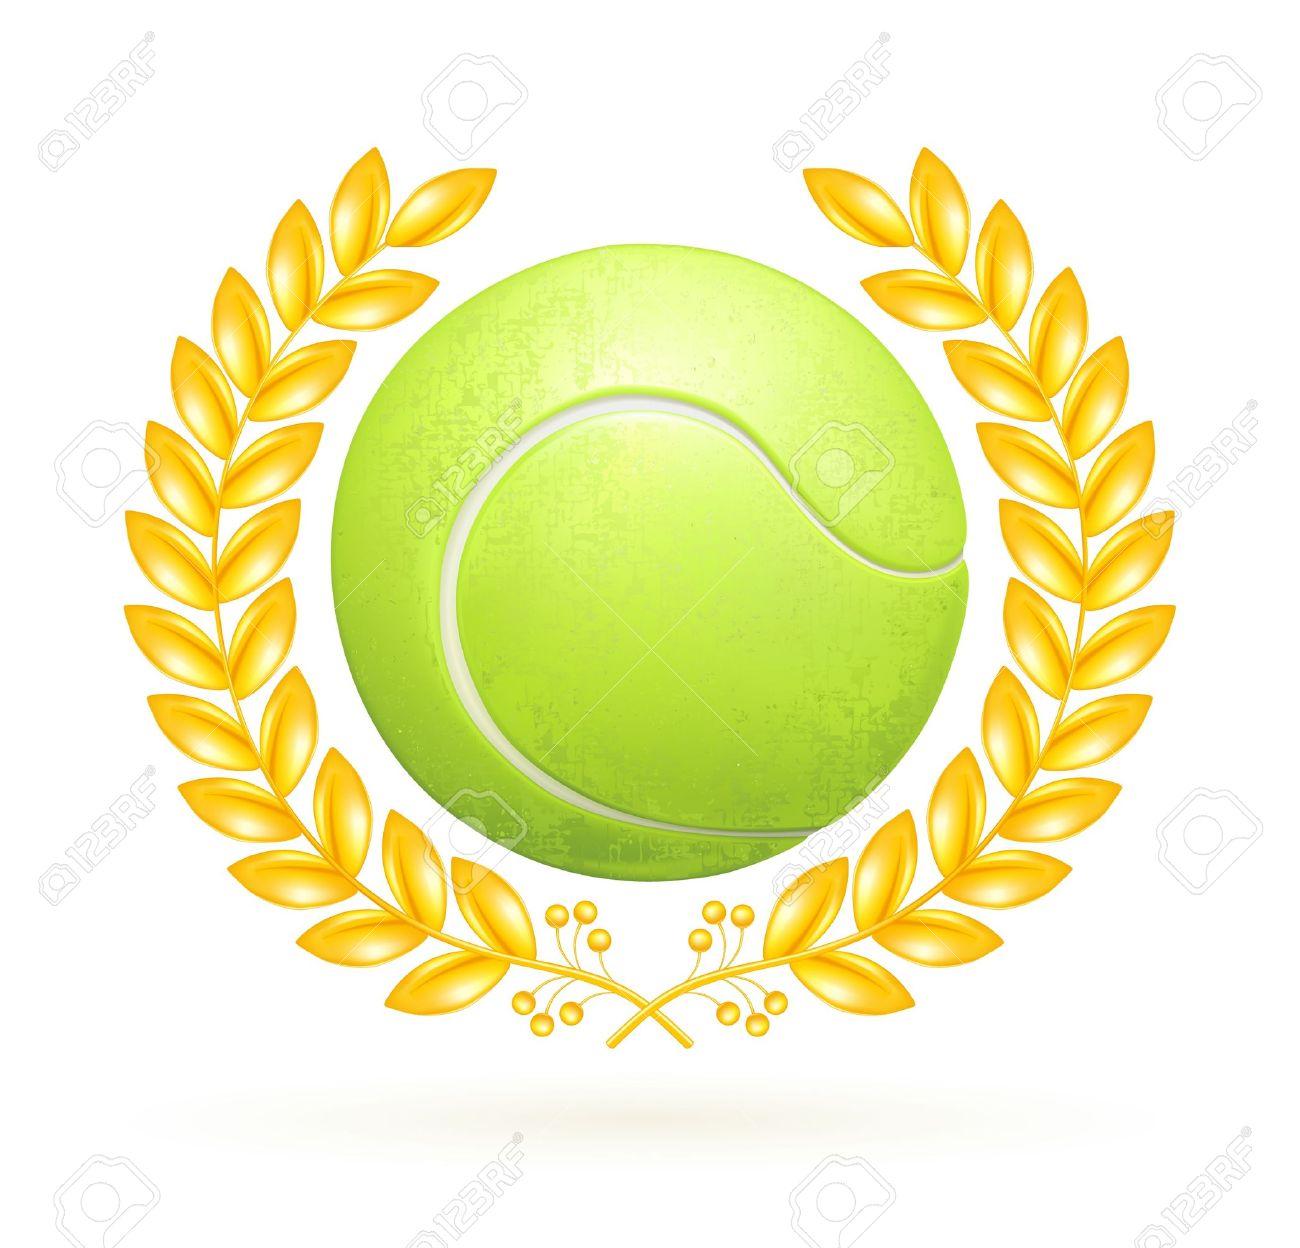 Tennis Trophy Clipart.